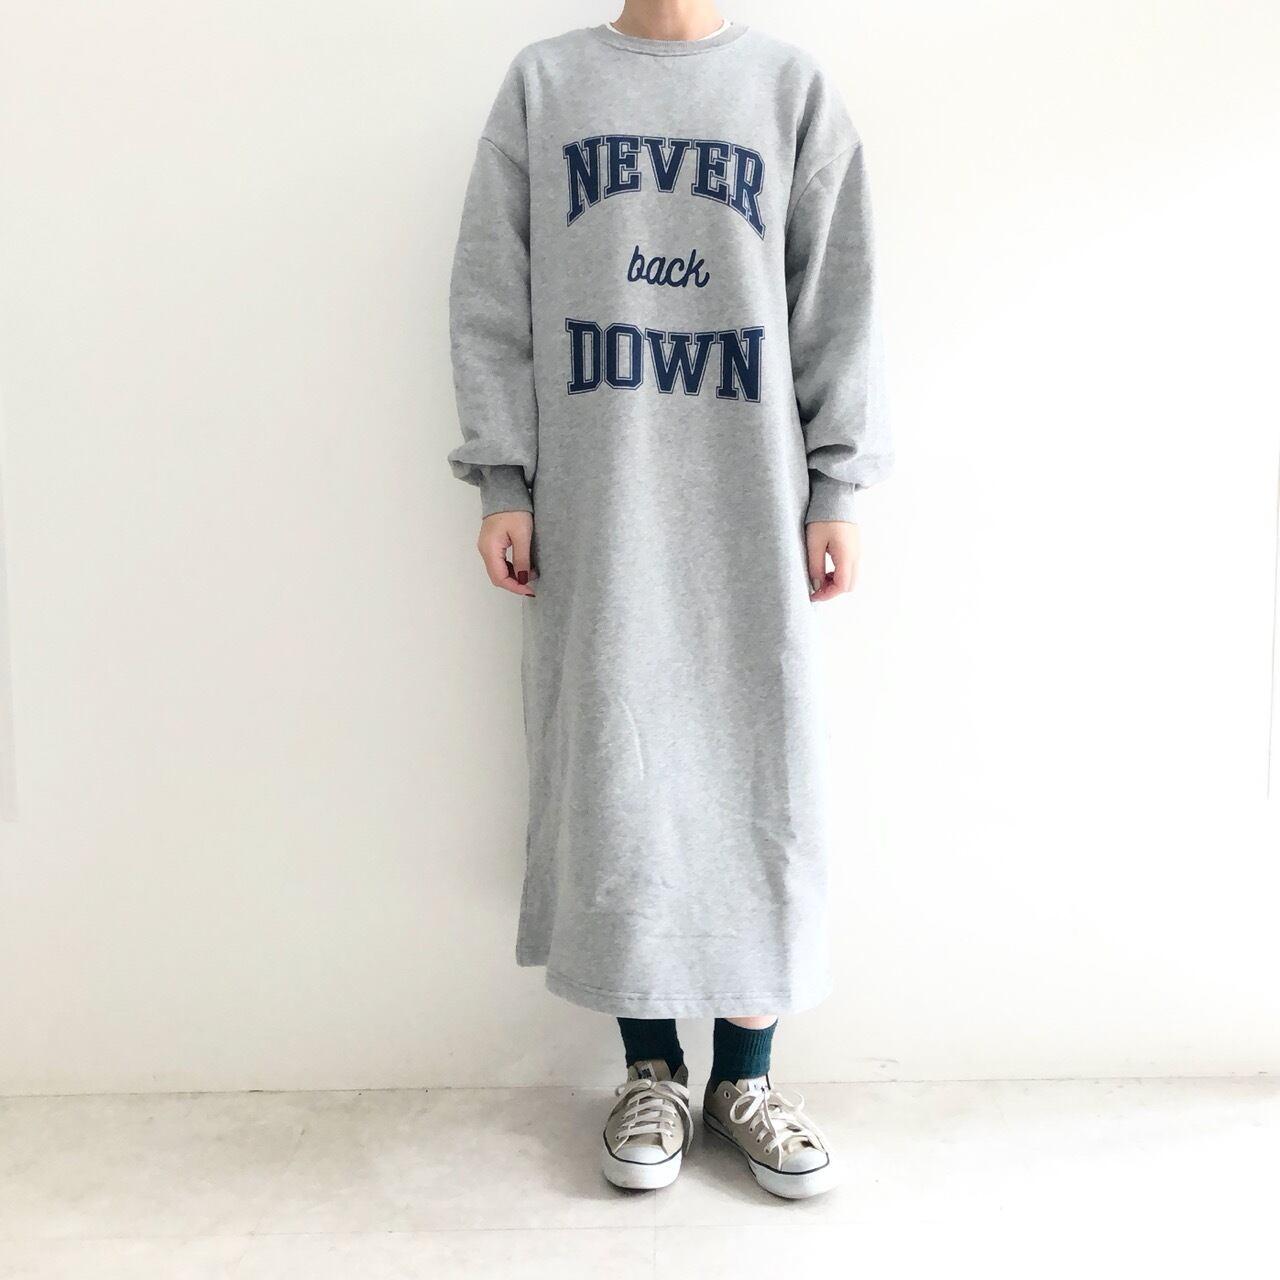 【 Days 】- 199-1065 - ロゴワンピース